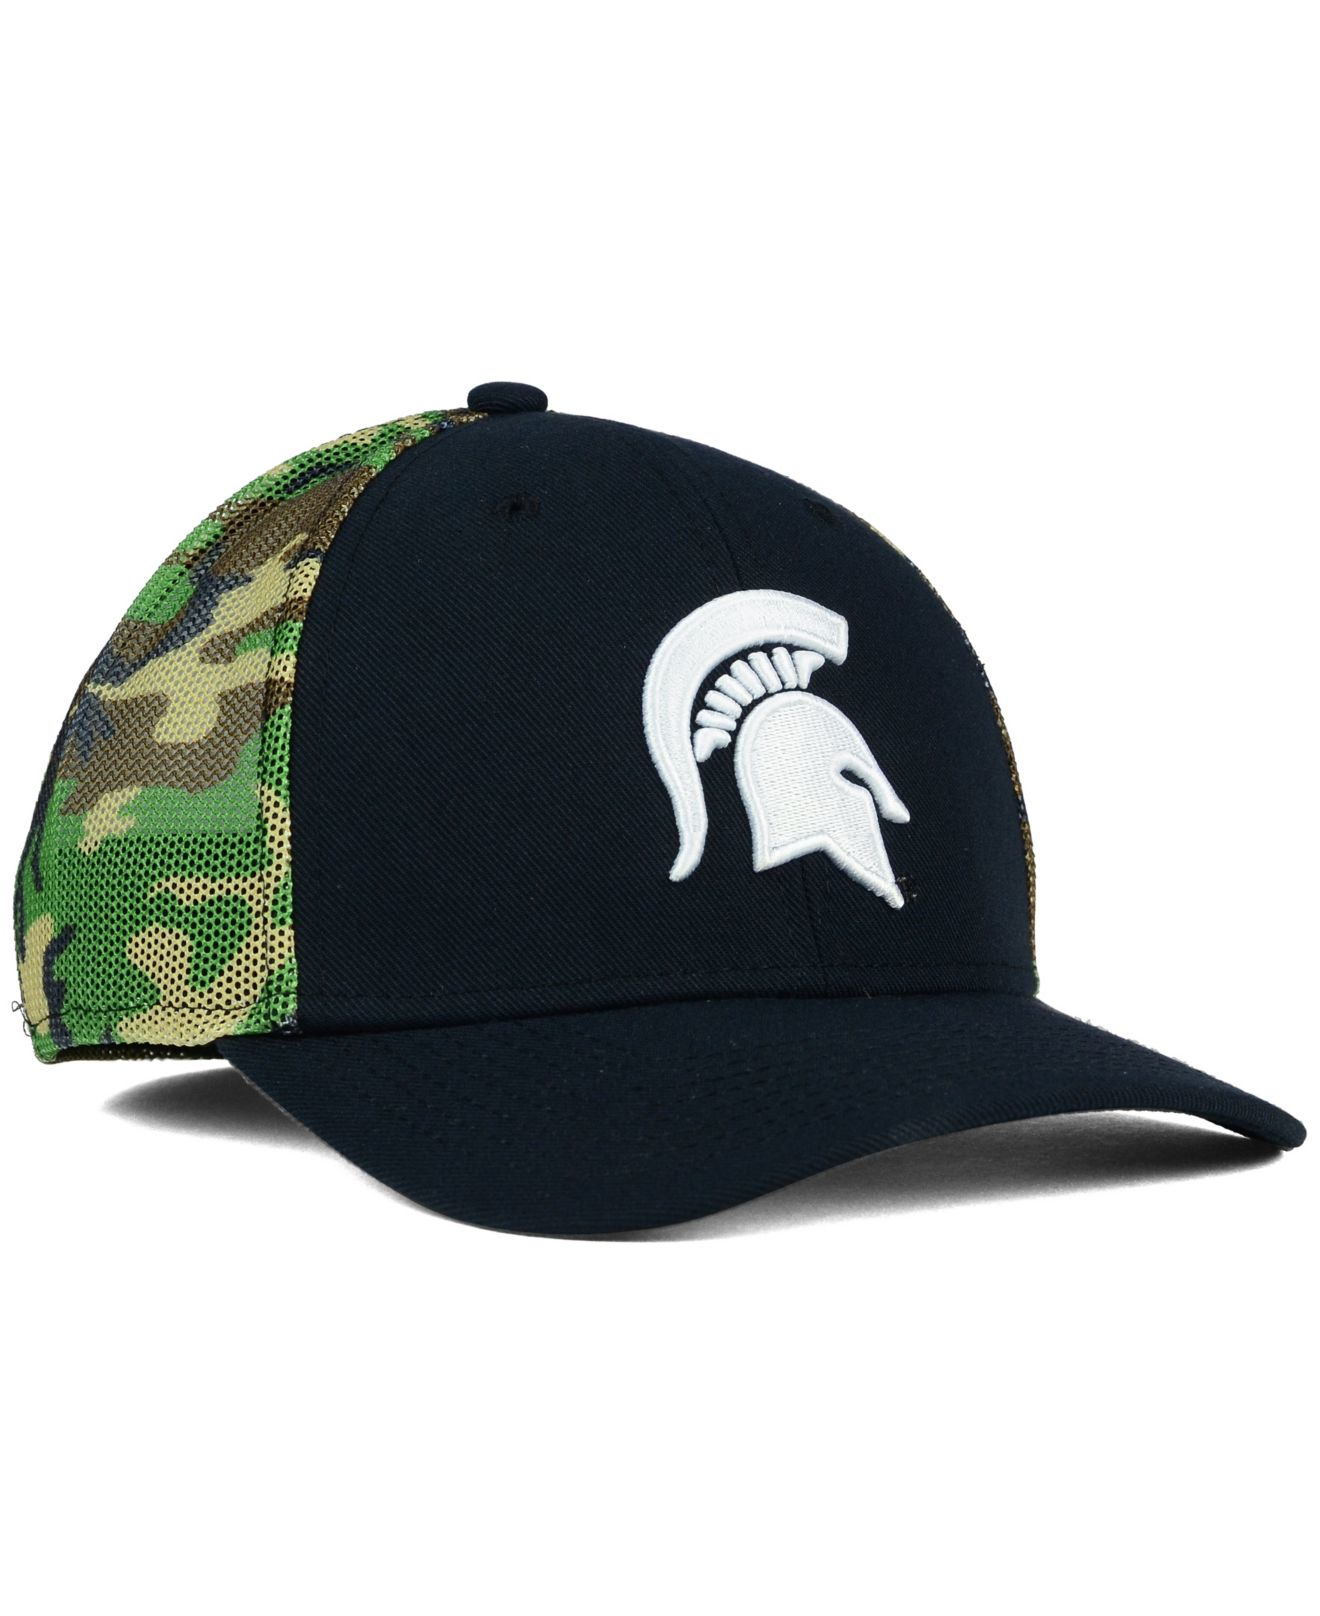 eff229d817aaf ... where can i buy lyst nike michigan state spartans camo hook swooshflex  cap in d6eb4 37621